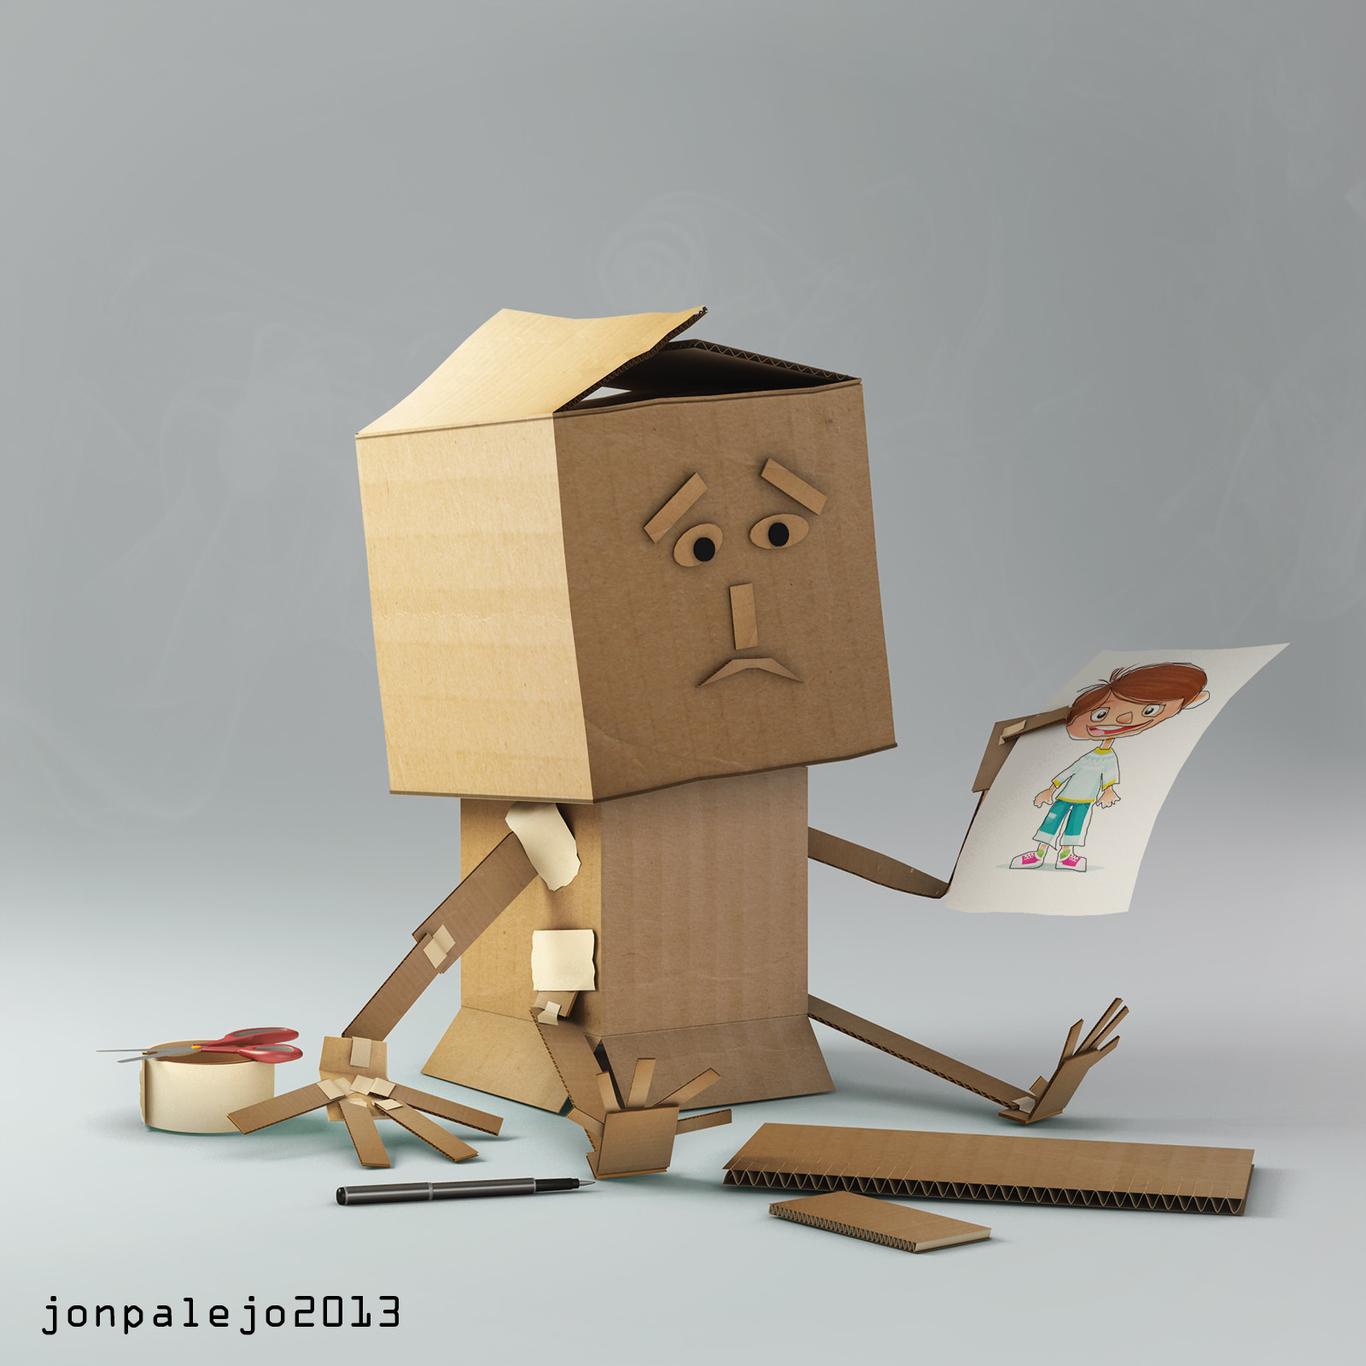 Jonamar i wan to be a real b 1 7900ab01 kp2e